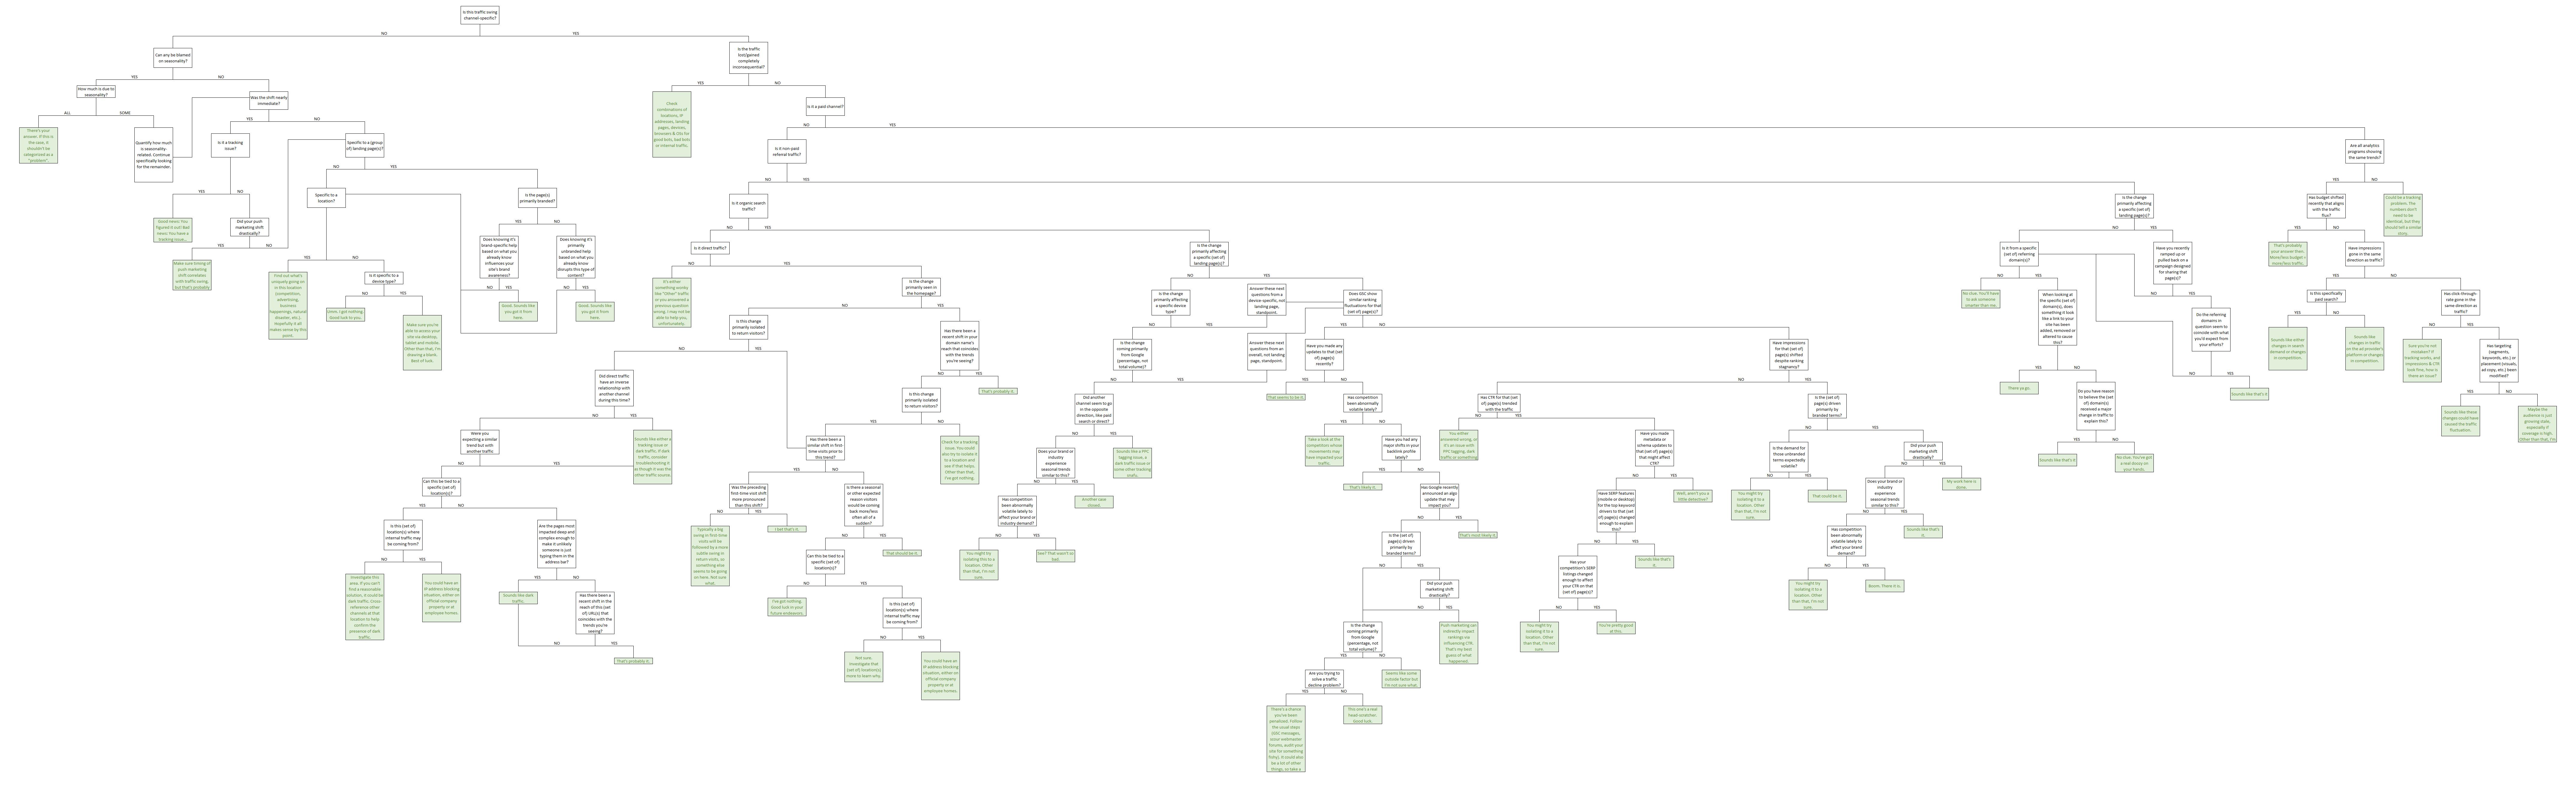 website traffic analysis decision tree